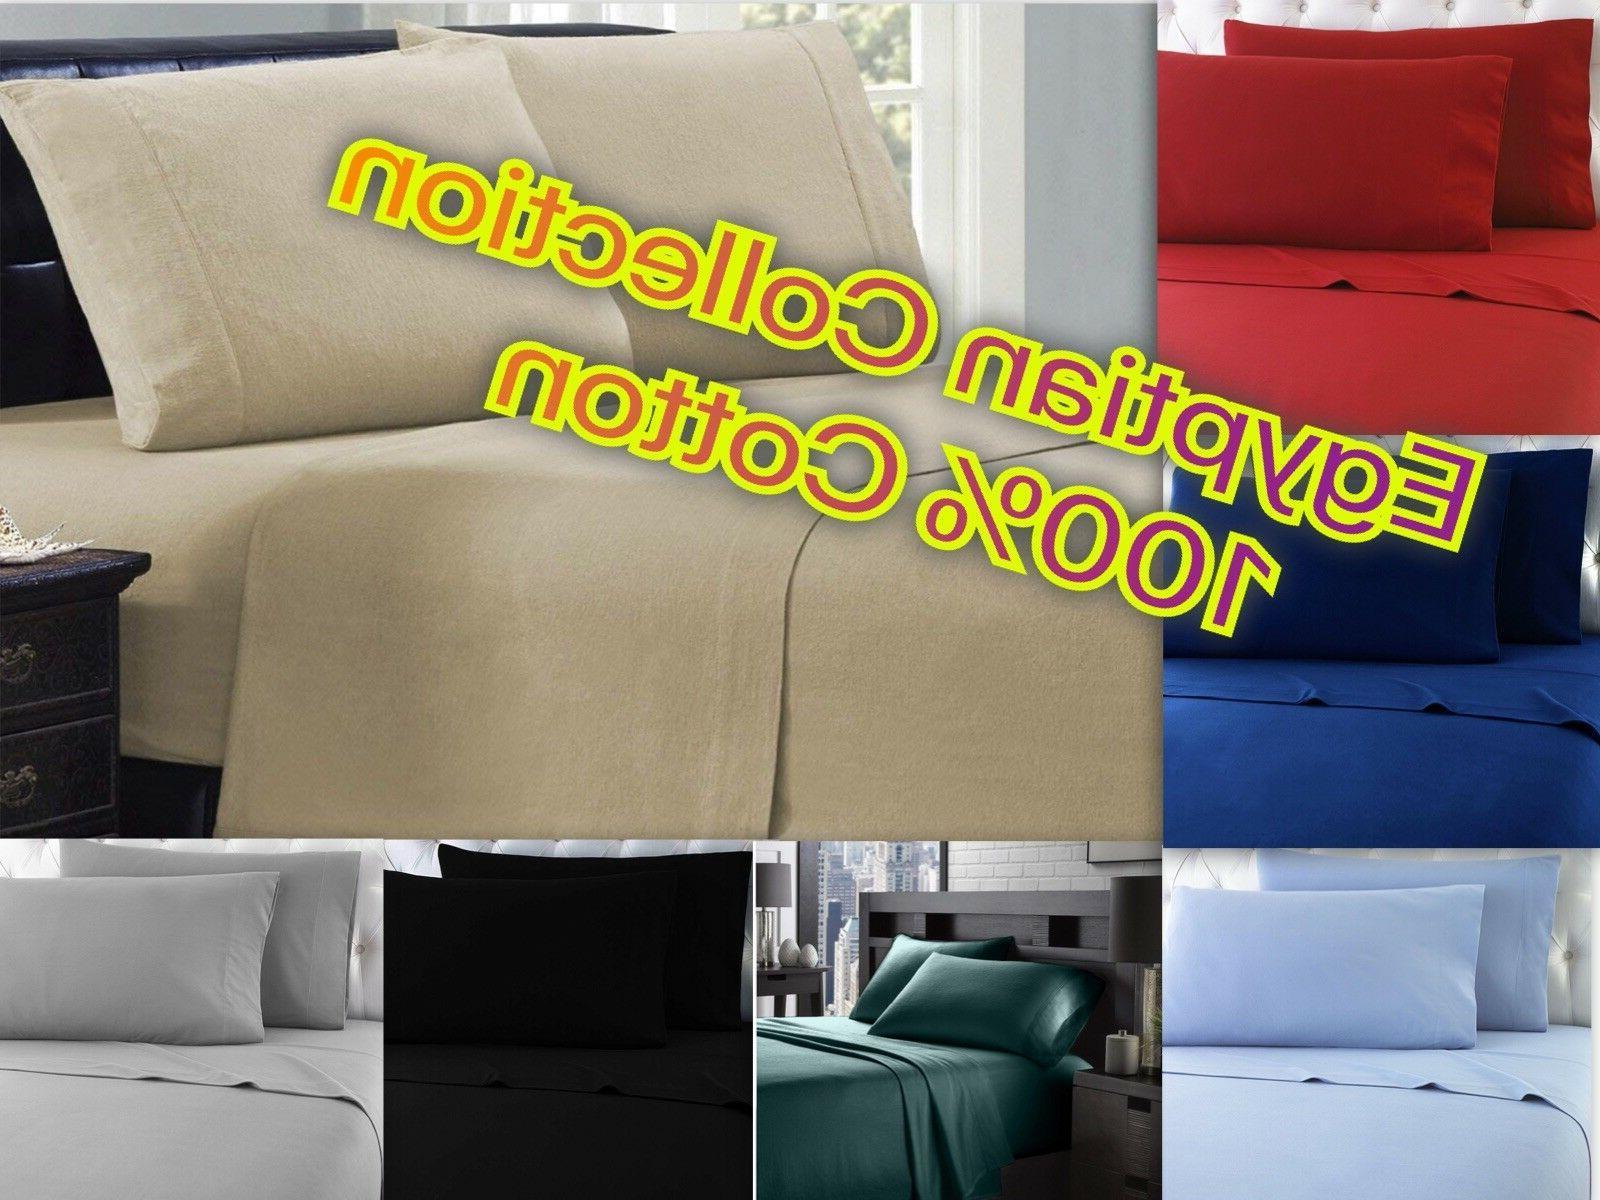 winter 100 percent cotton sheet set egyptian